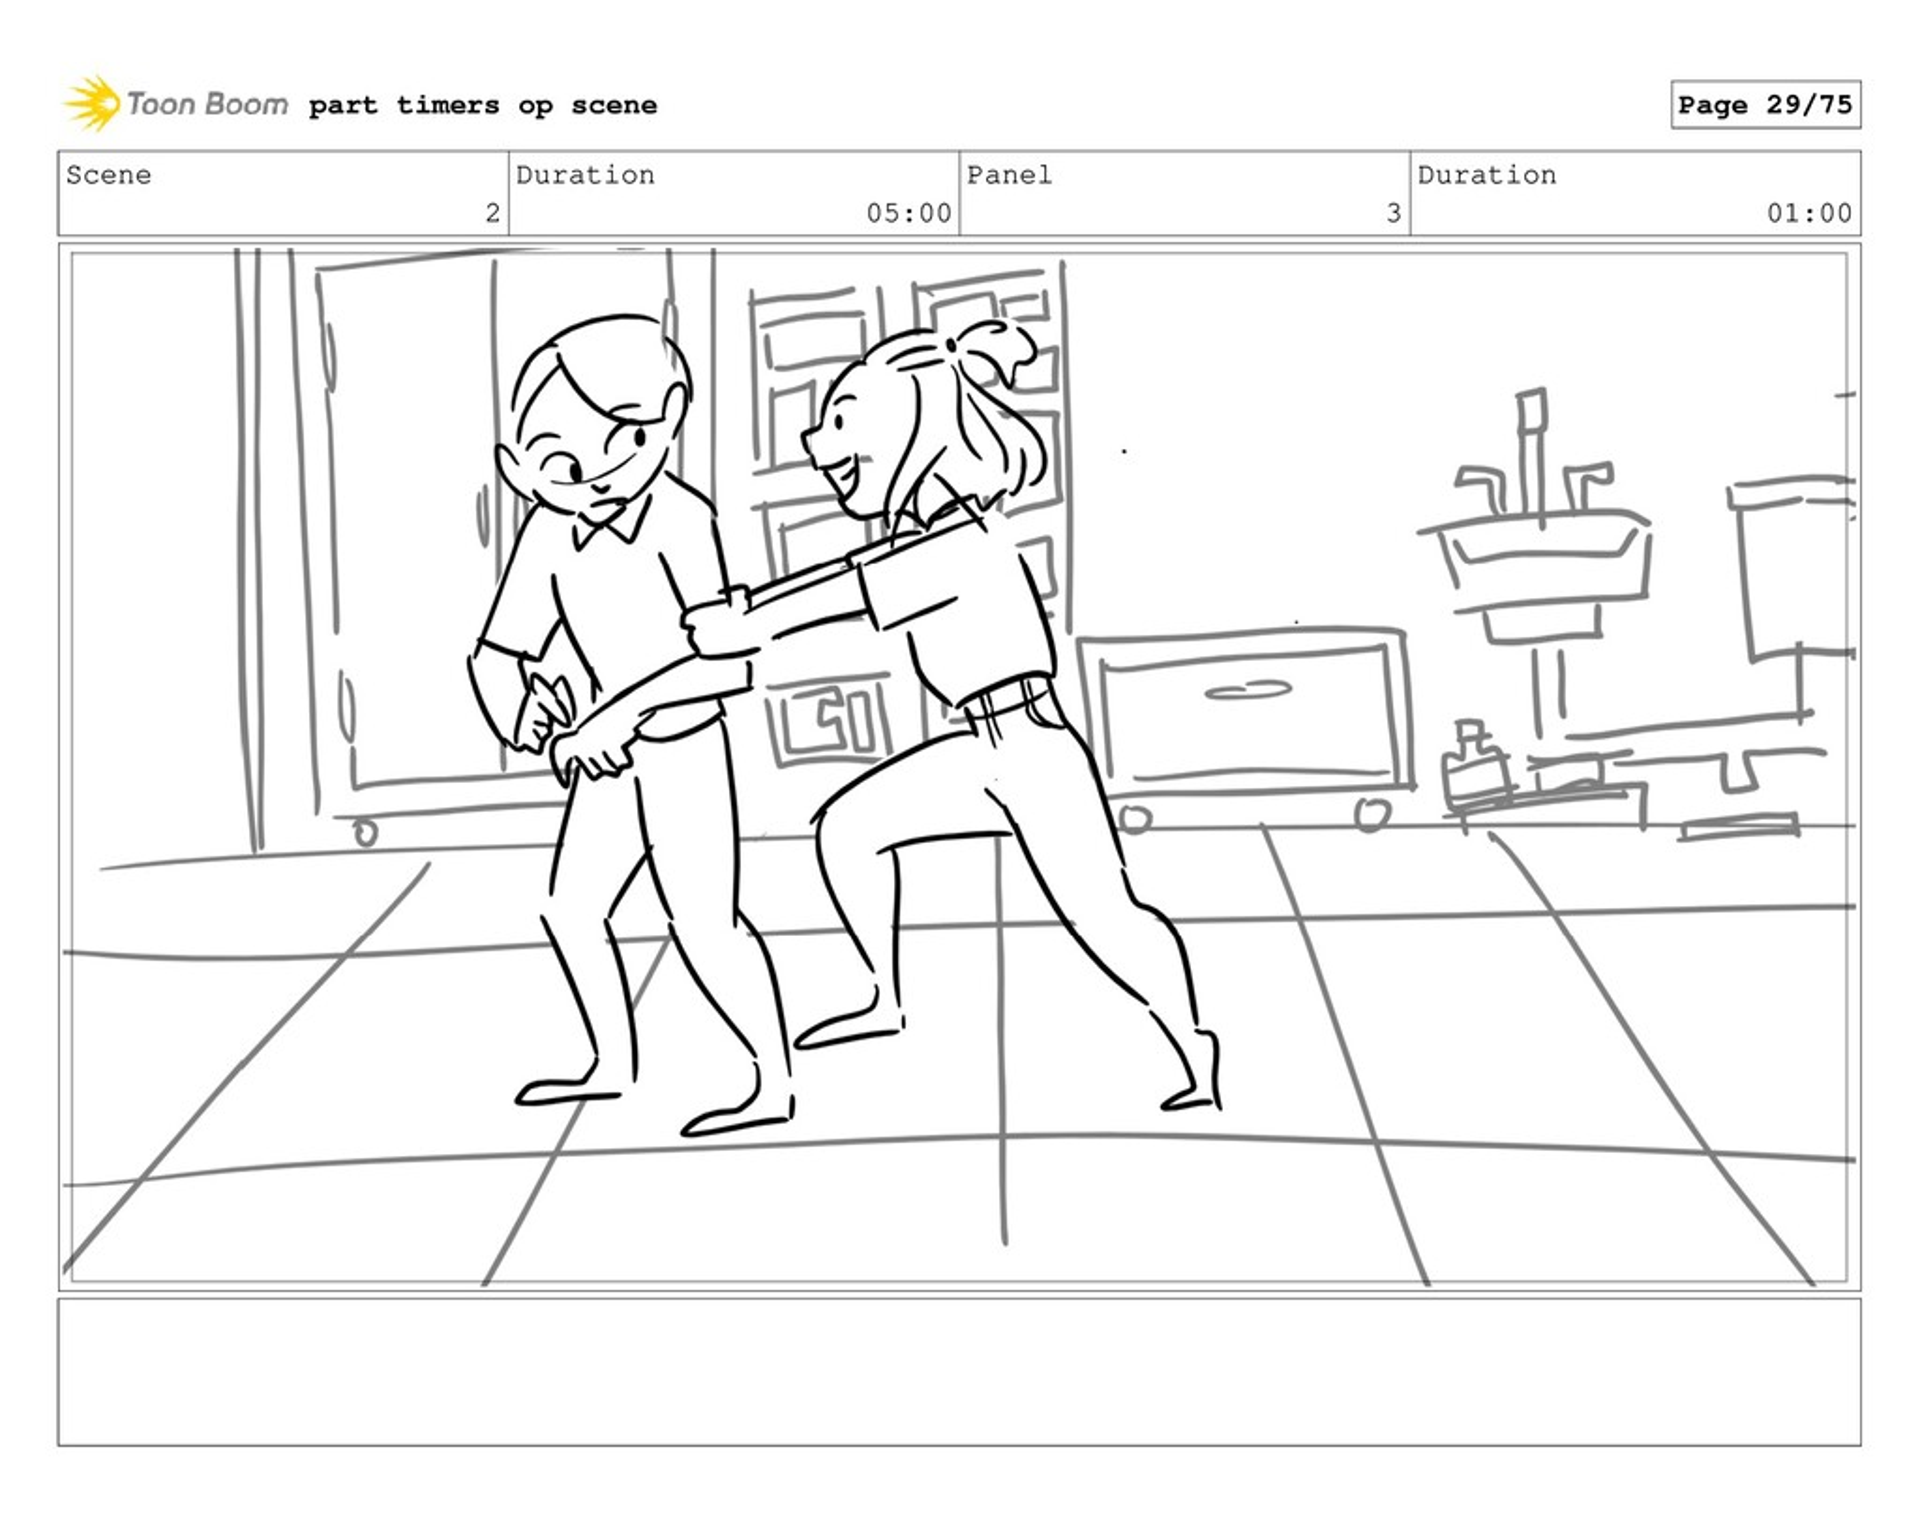 Scene 2 Duration 05:00 Panel 3 Duration 01:00 p...